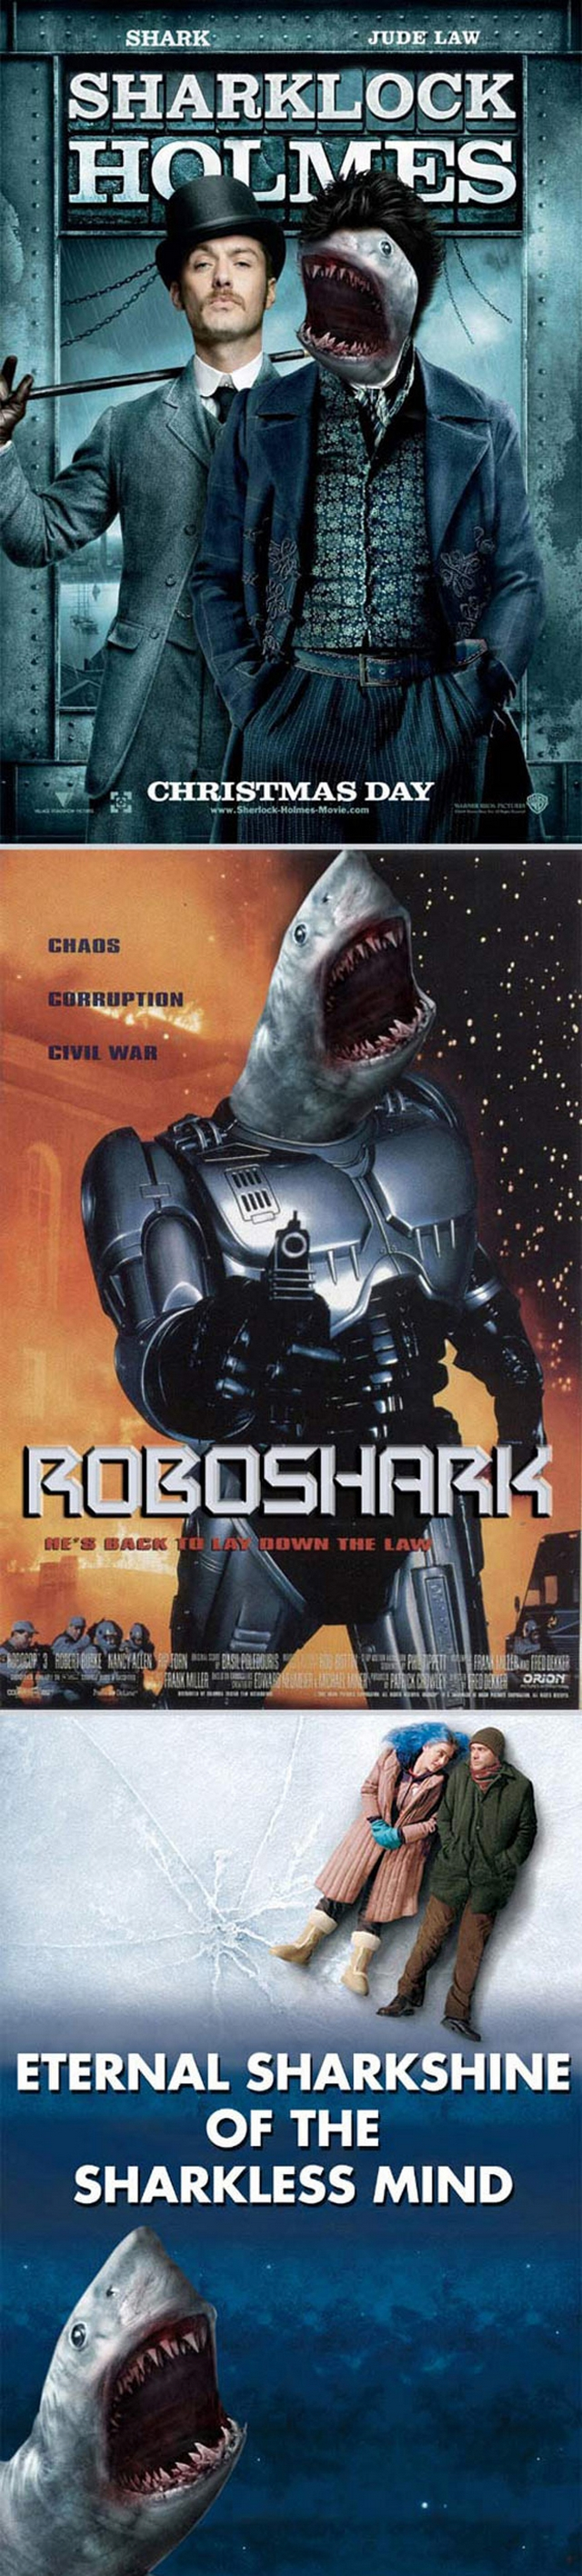 Sharks Make Movies More Fun